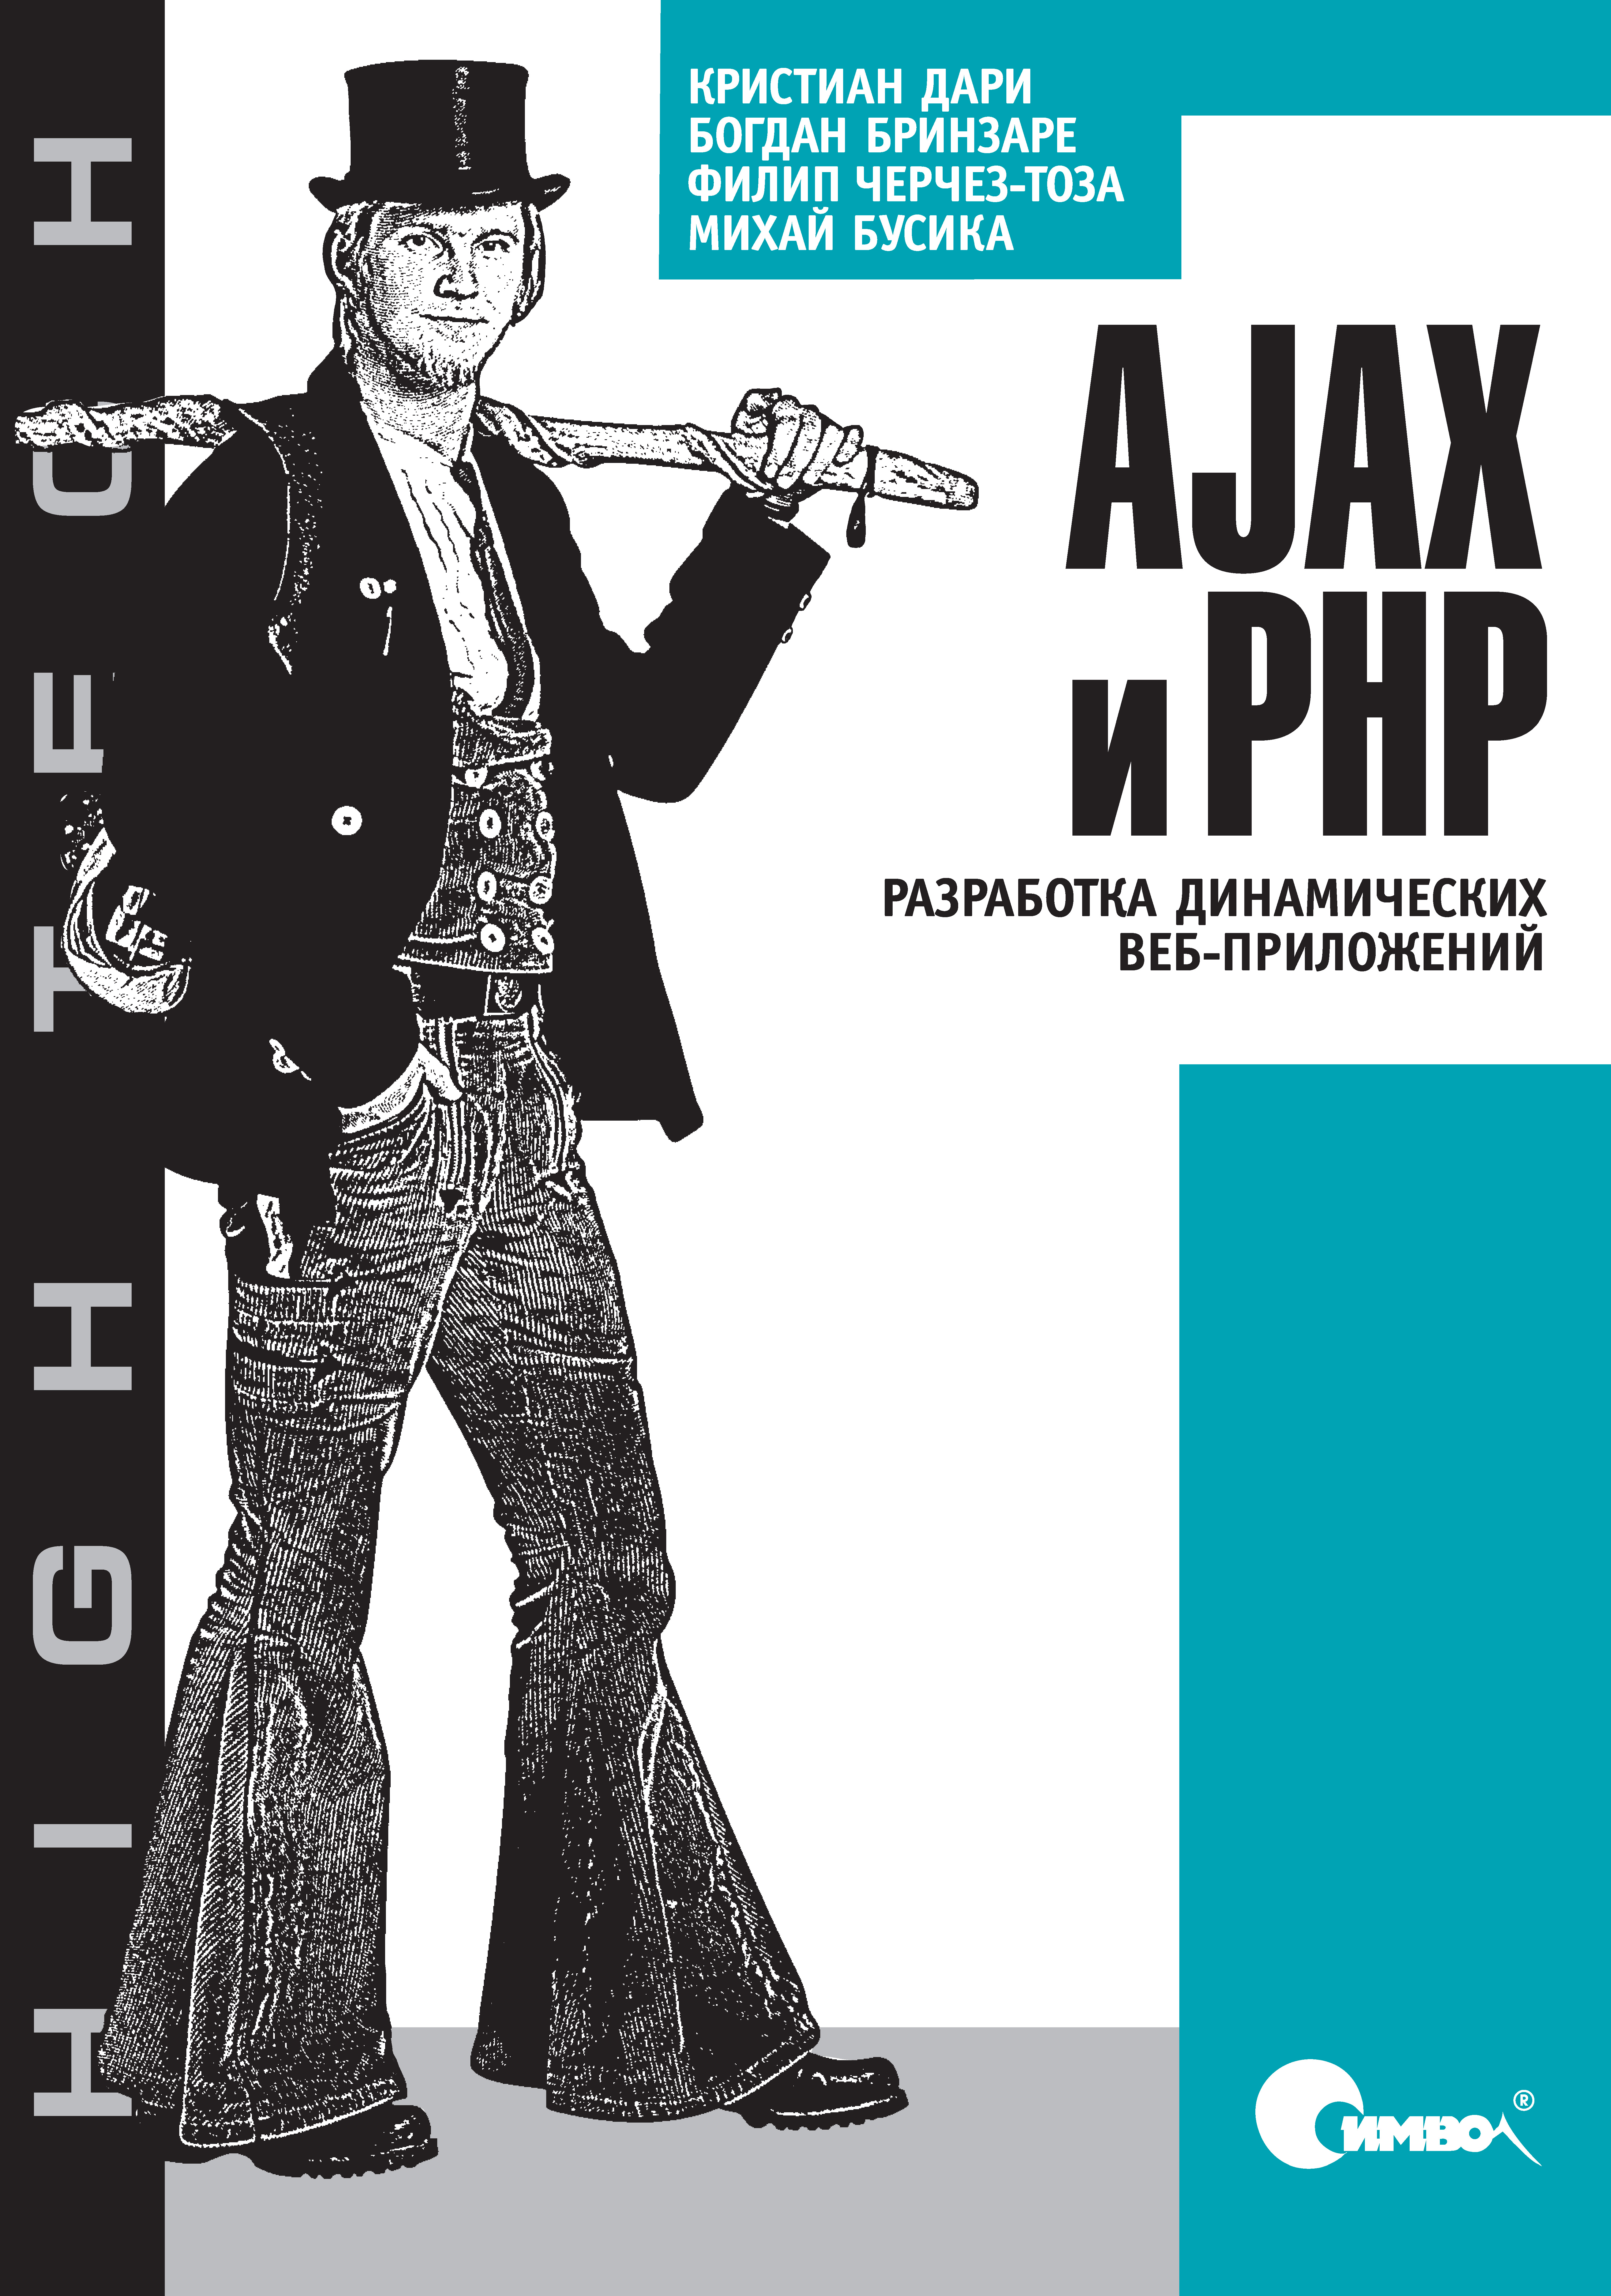 Кристиан Дари AJAX и PHP. Разработка динамических веб-приложений веб мастеринг на 100 % html css javascript php cms ajax раскрутка